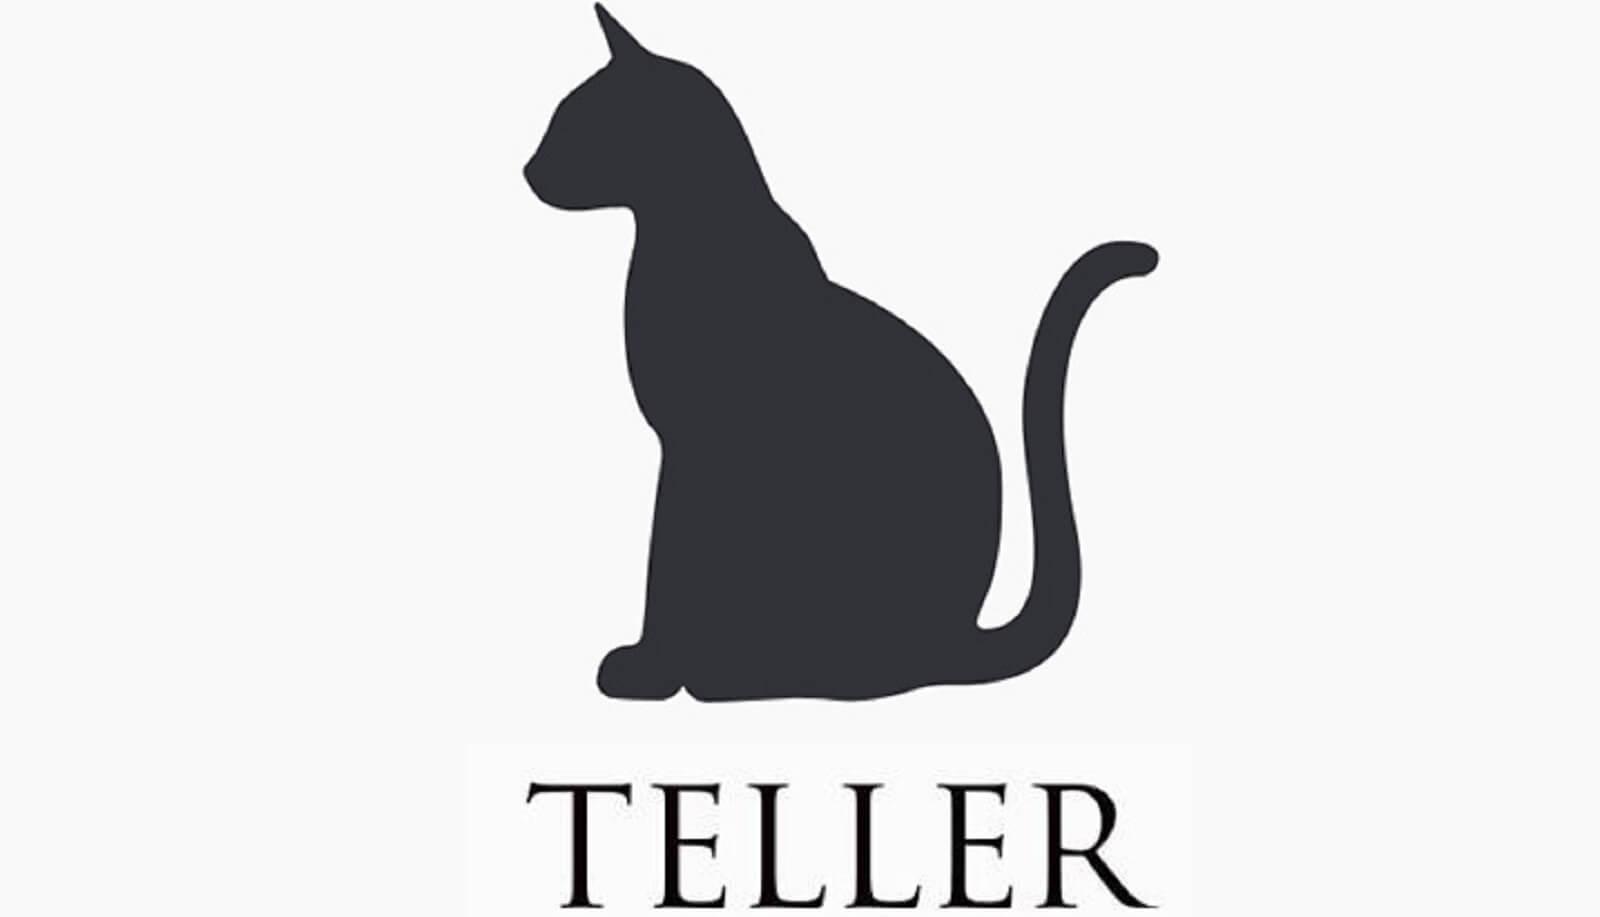 TELLER、アプリで無料でオリジナルの小説が読める!?